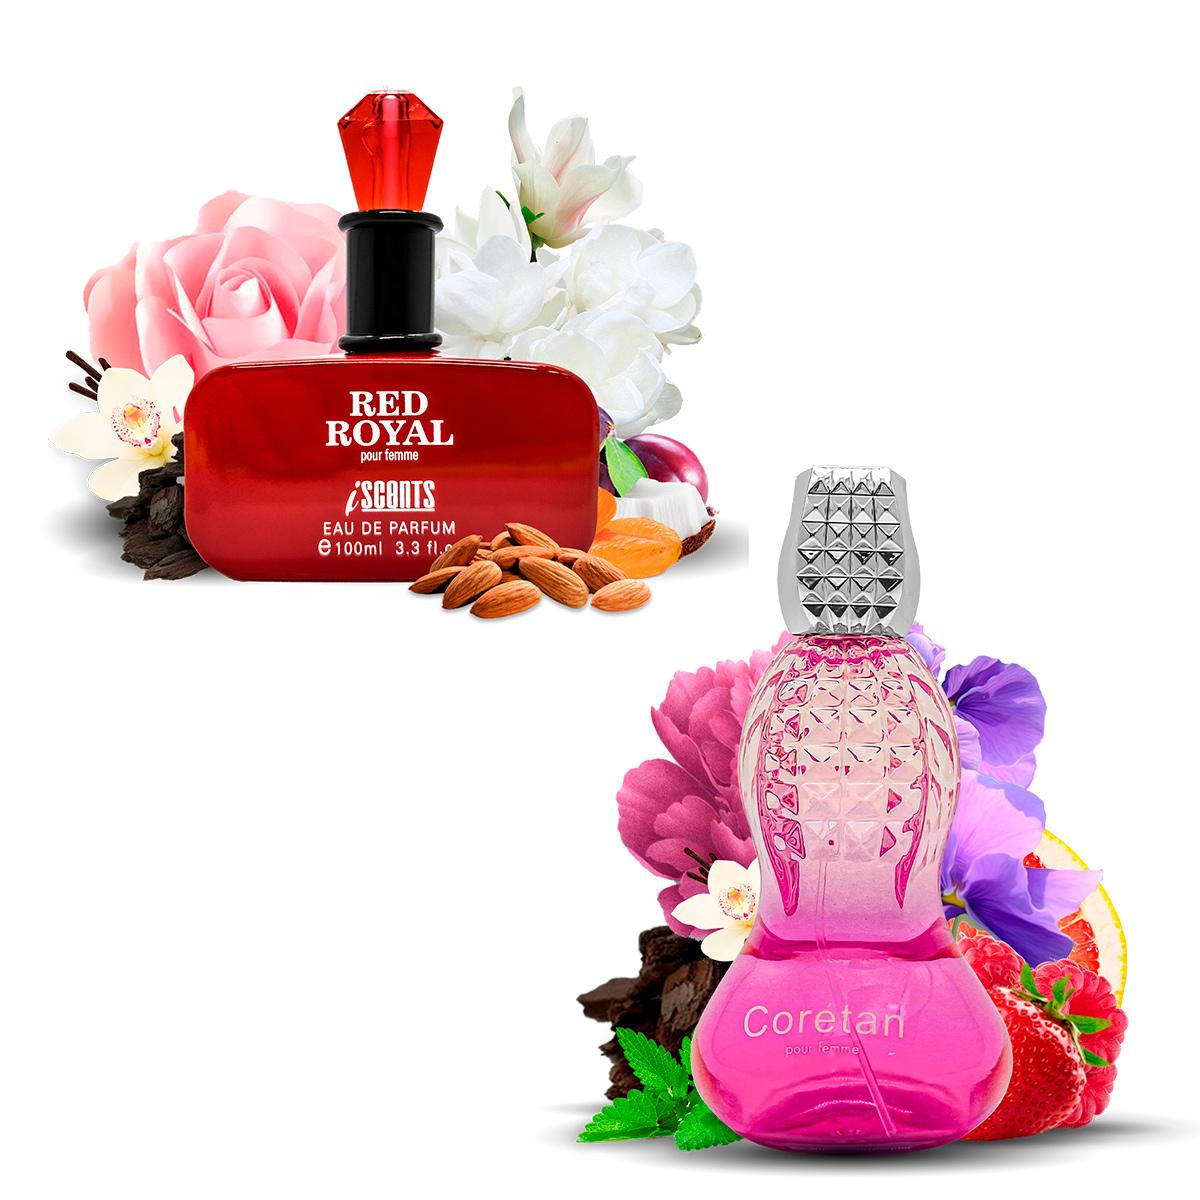 Kit 2 Perfumes Importados Red Royal e Coretan I Scents